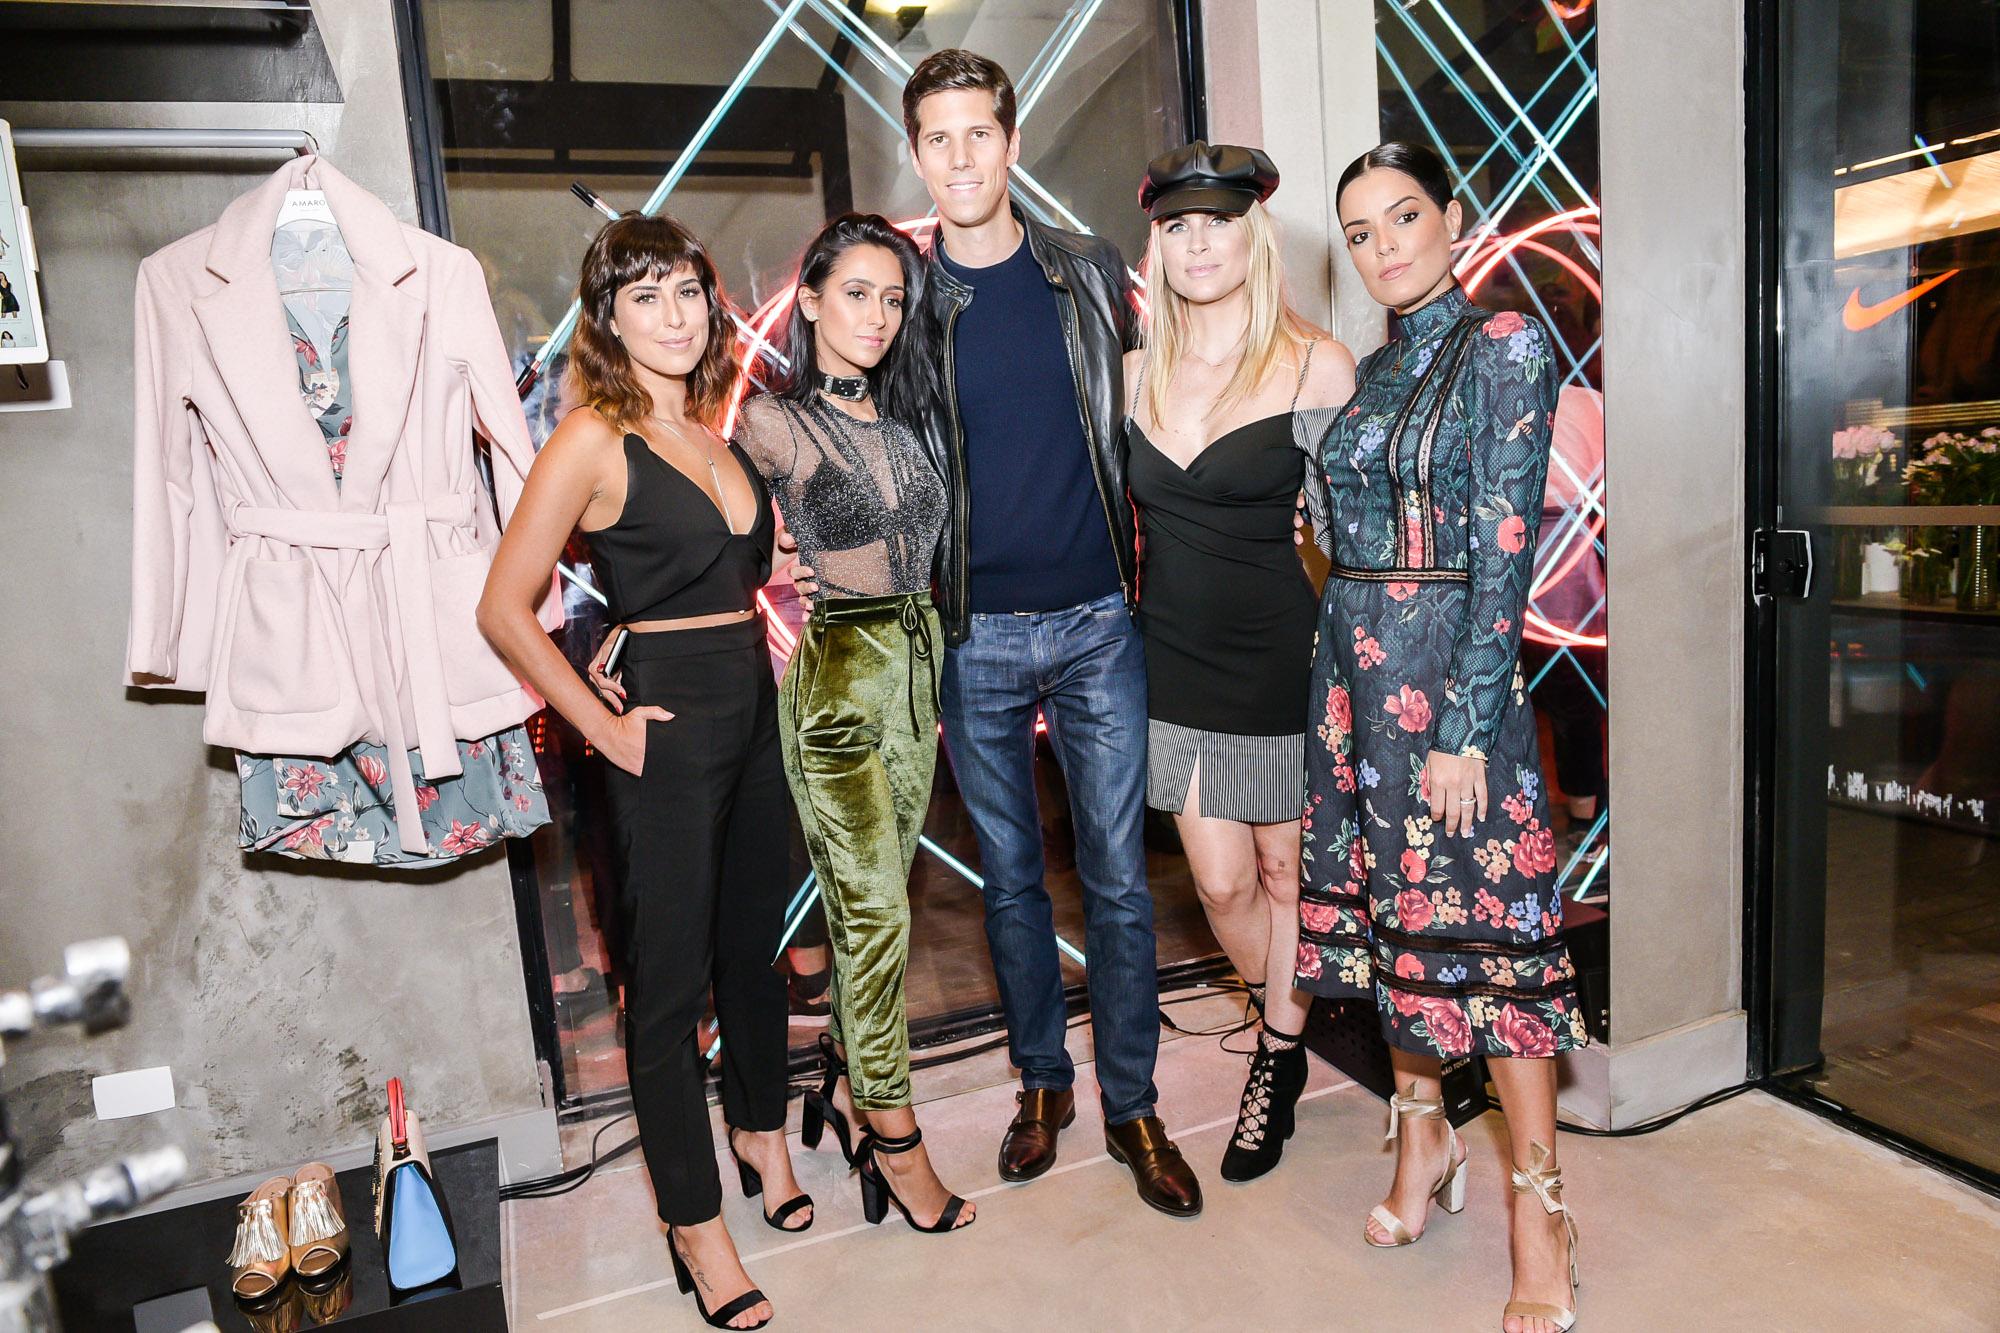 Francesca Monfrinatti, Fernanda Paes Leme, Dominique Oliver, Julia Faria e Mariah Bernardes